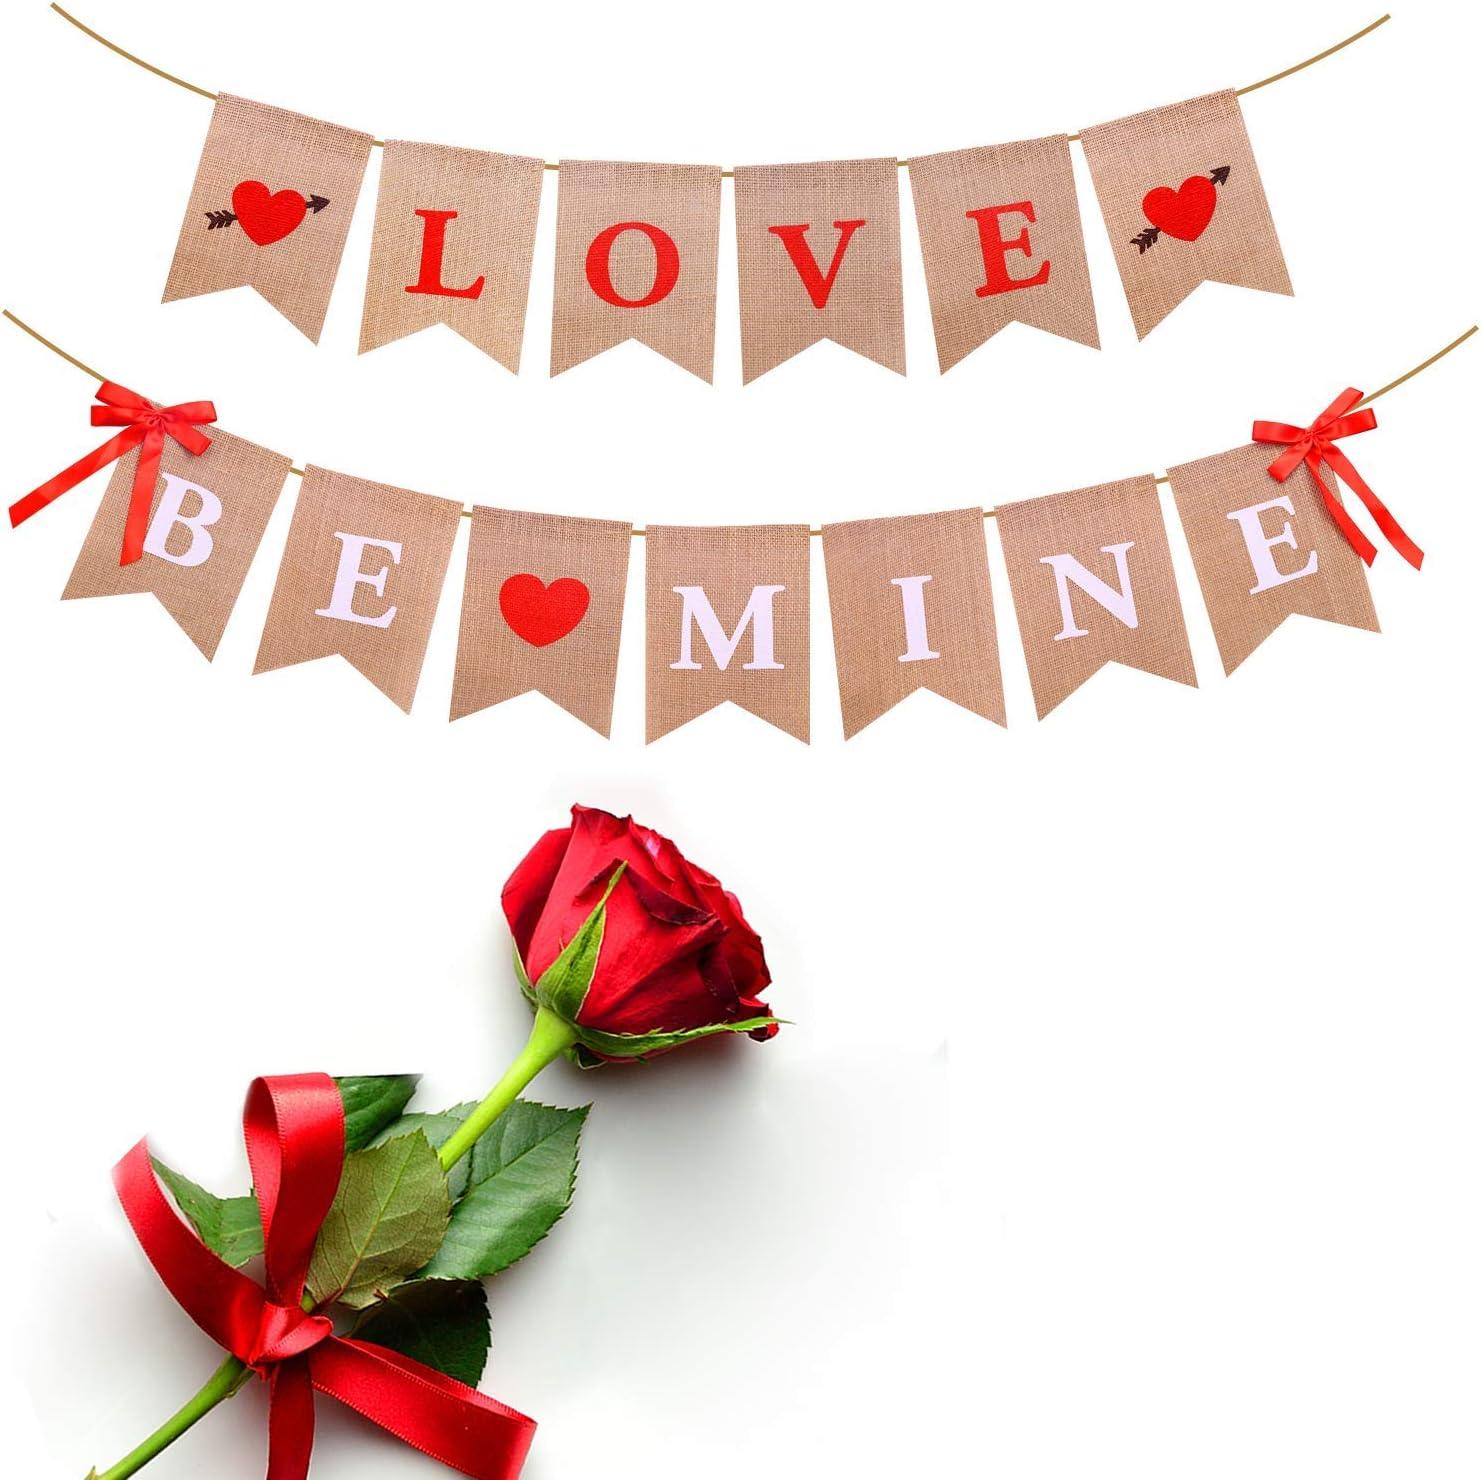 Valentines Gift Linen Heart Burlap Heart Valentines Day Decor Heart Decor Burlap Wedding Decor Valentine Favor Valentine Heart Rustic Decor